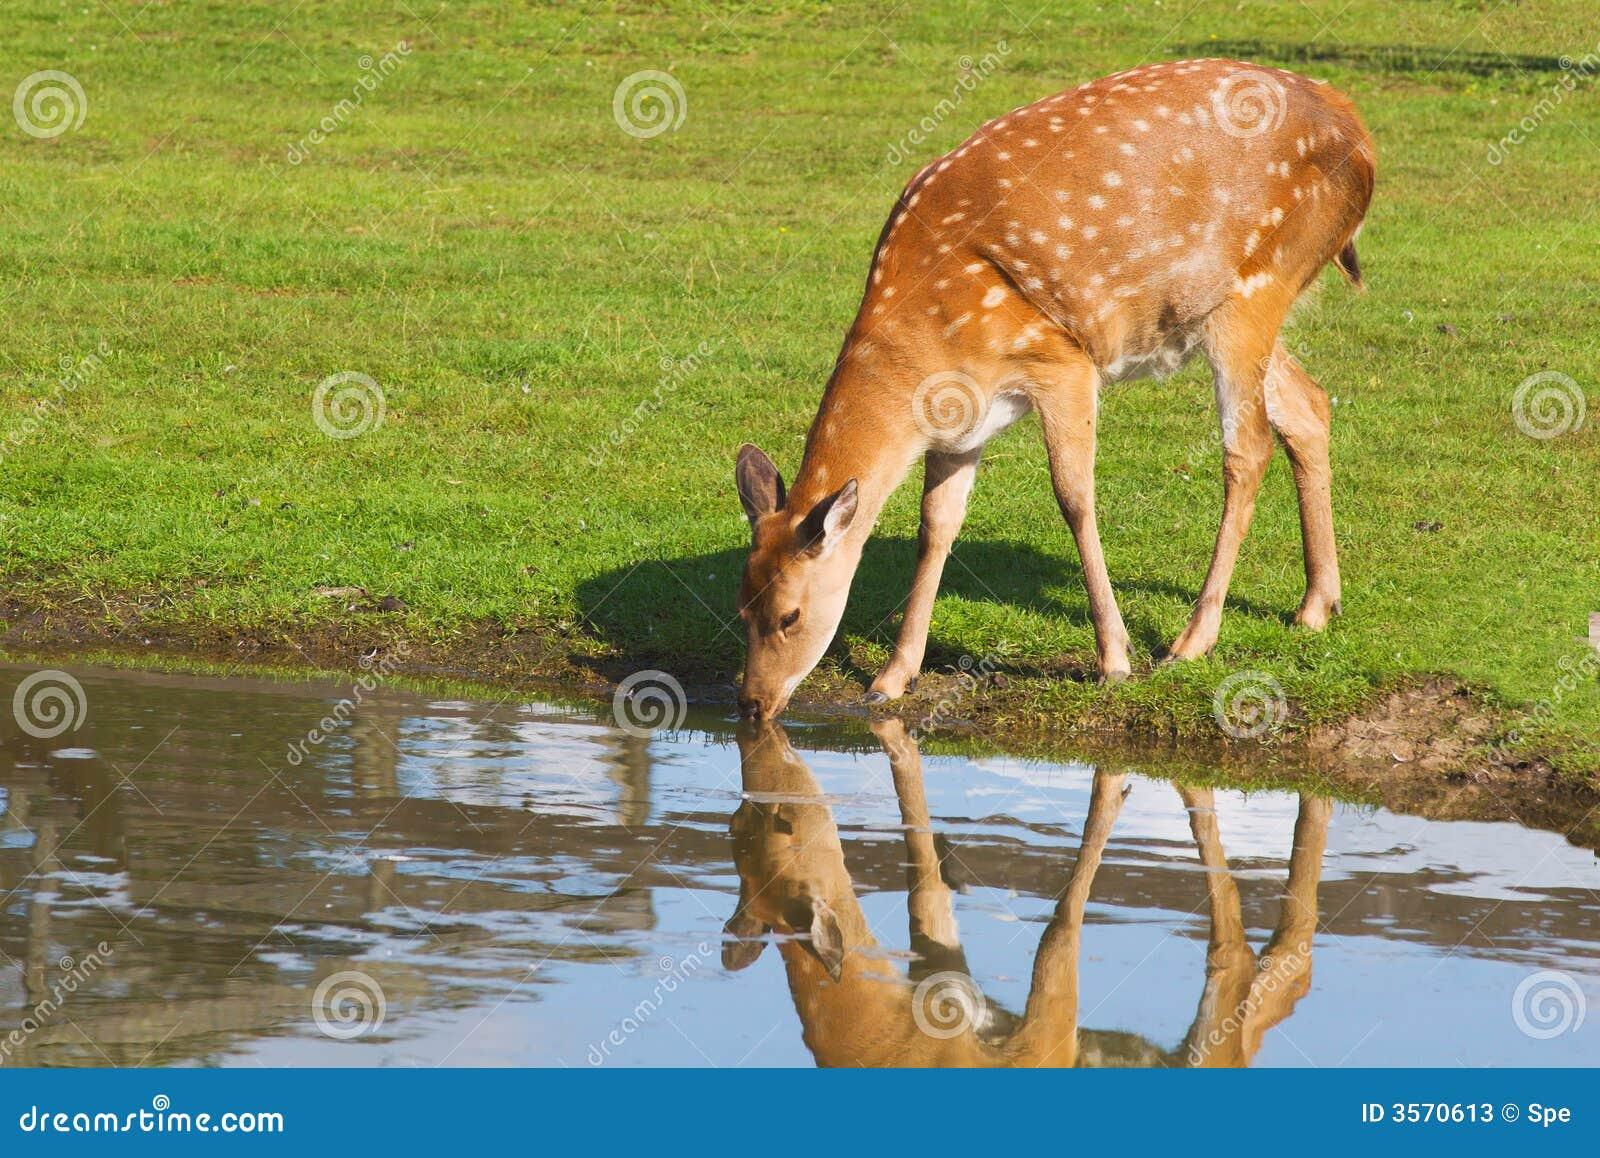 Clipart Of Deer Drinking Water